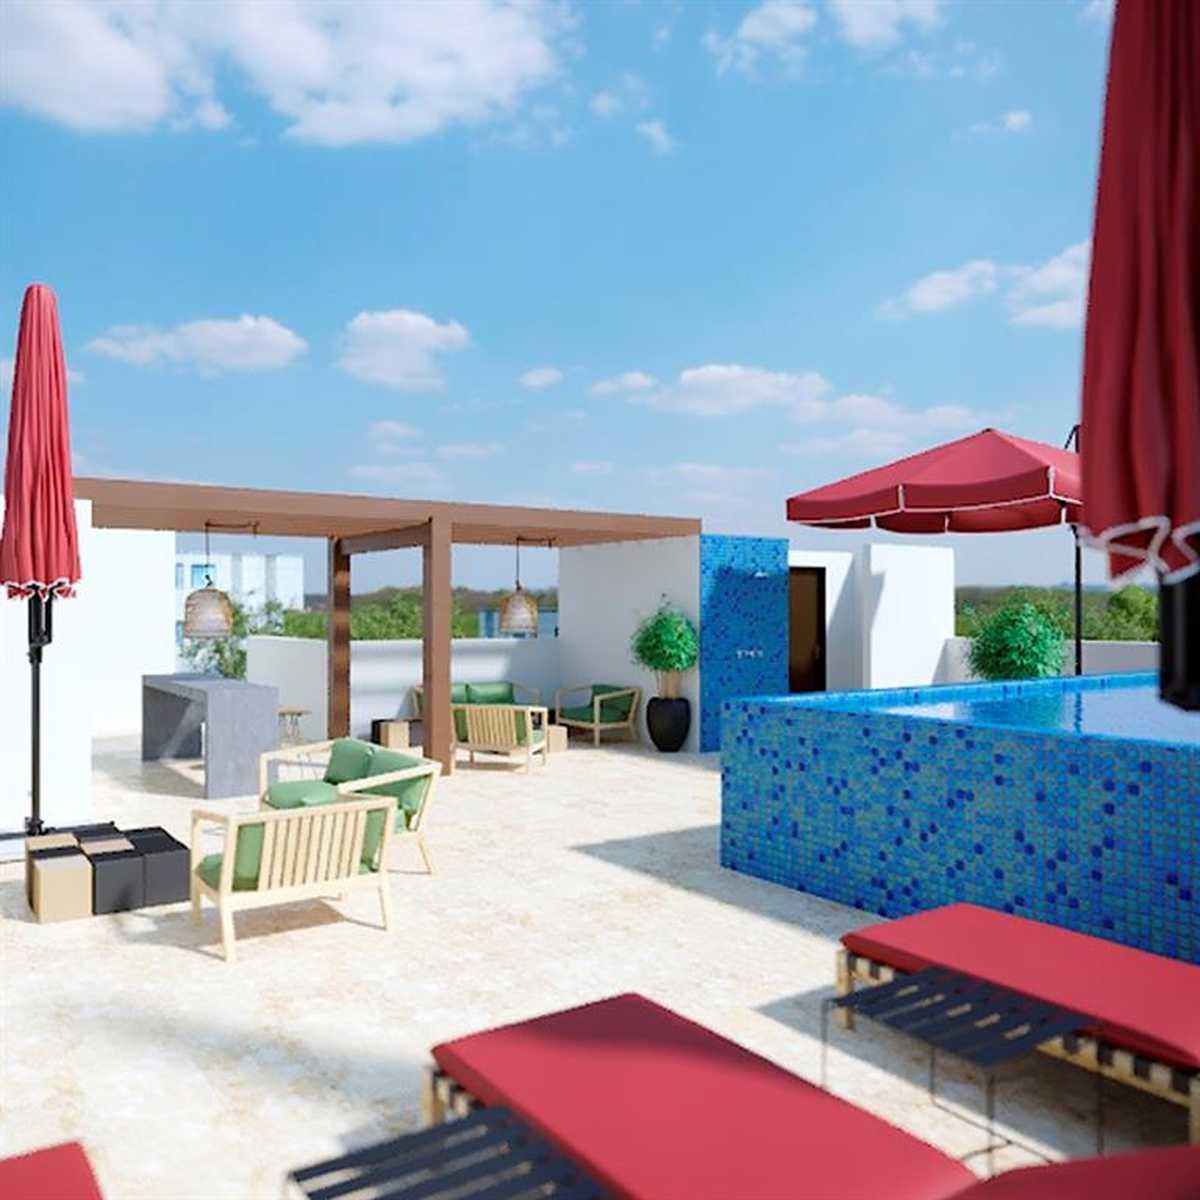 $264,400 - 2Br/1Ba -  for Sale in Other, Playa Del Carmen